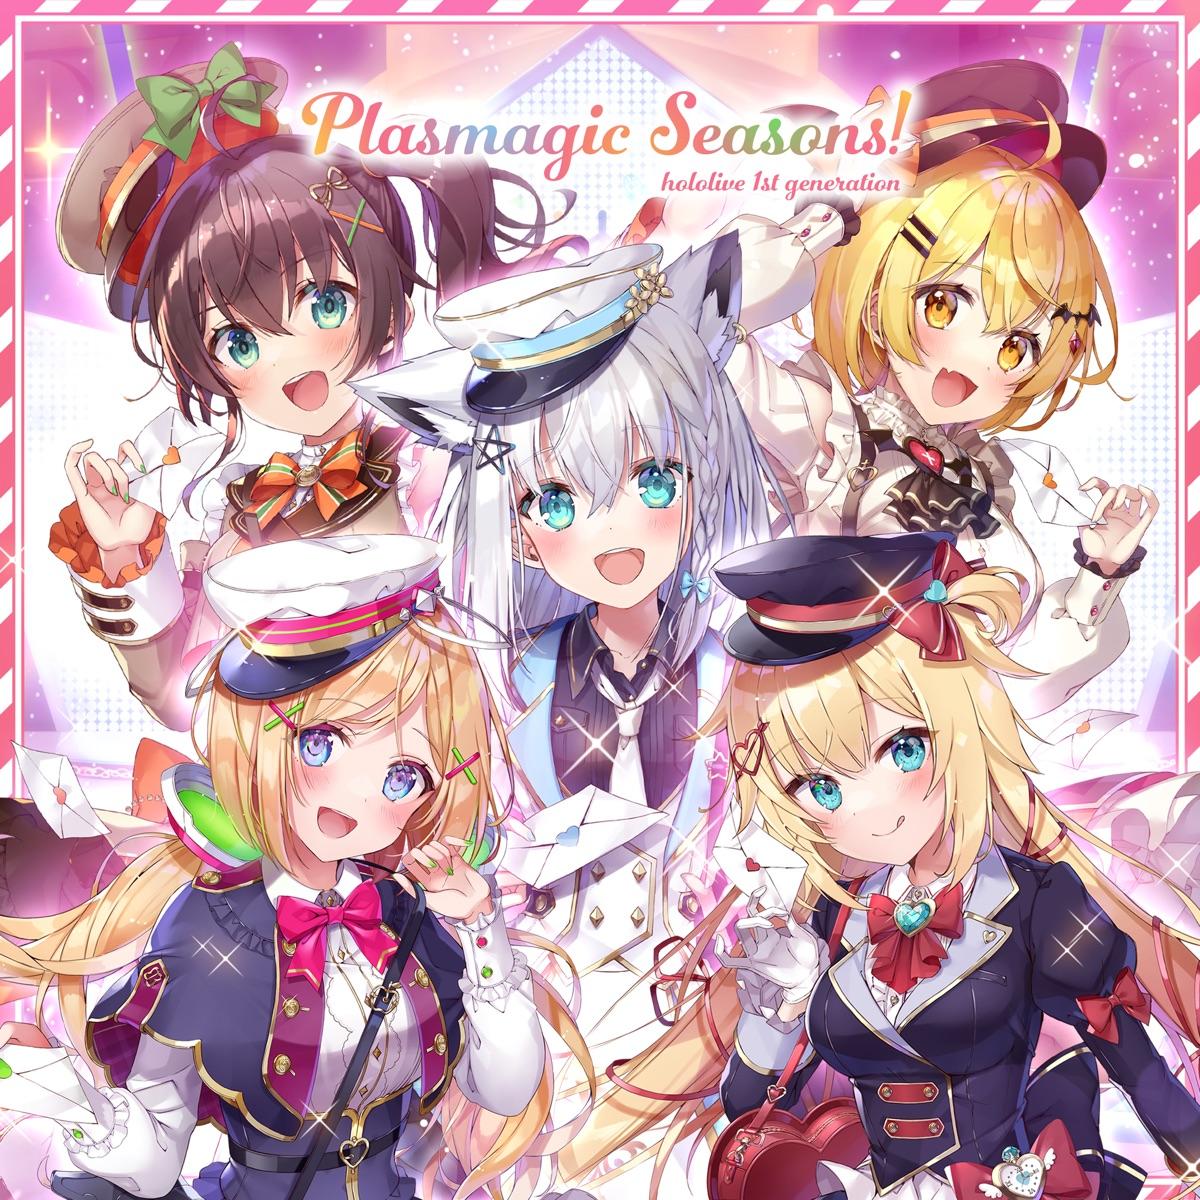 『hololive 1st Generation - Plasmagic Seasons!』収録の『Plasmagic Seasons!』ジャケット